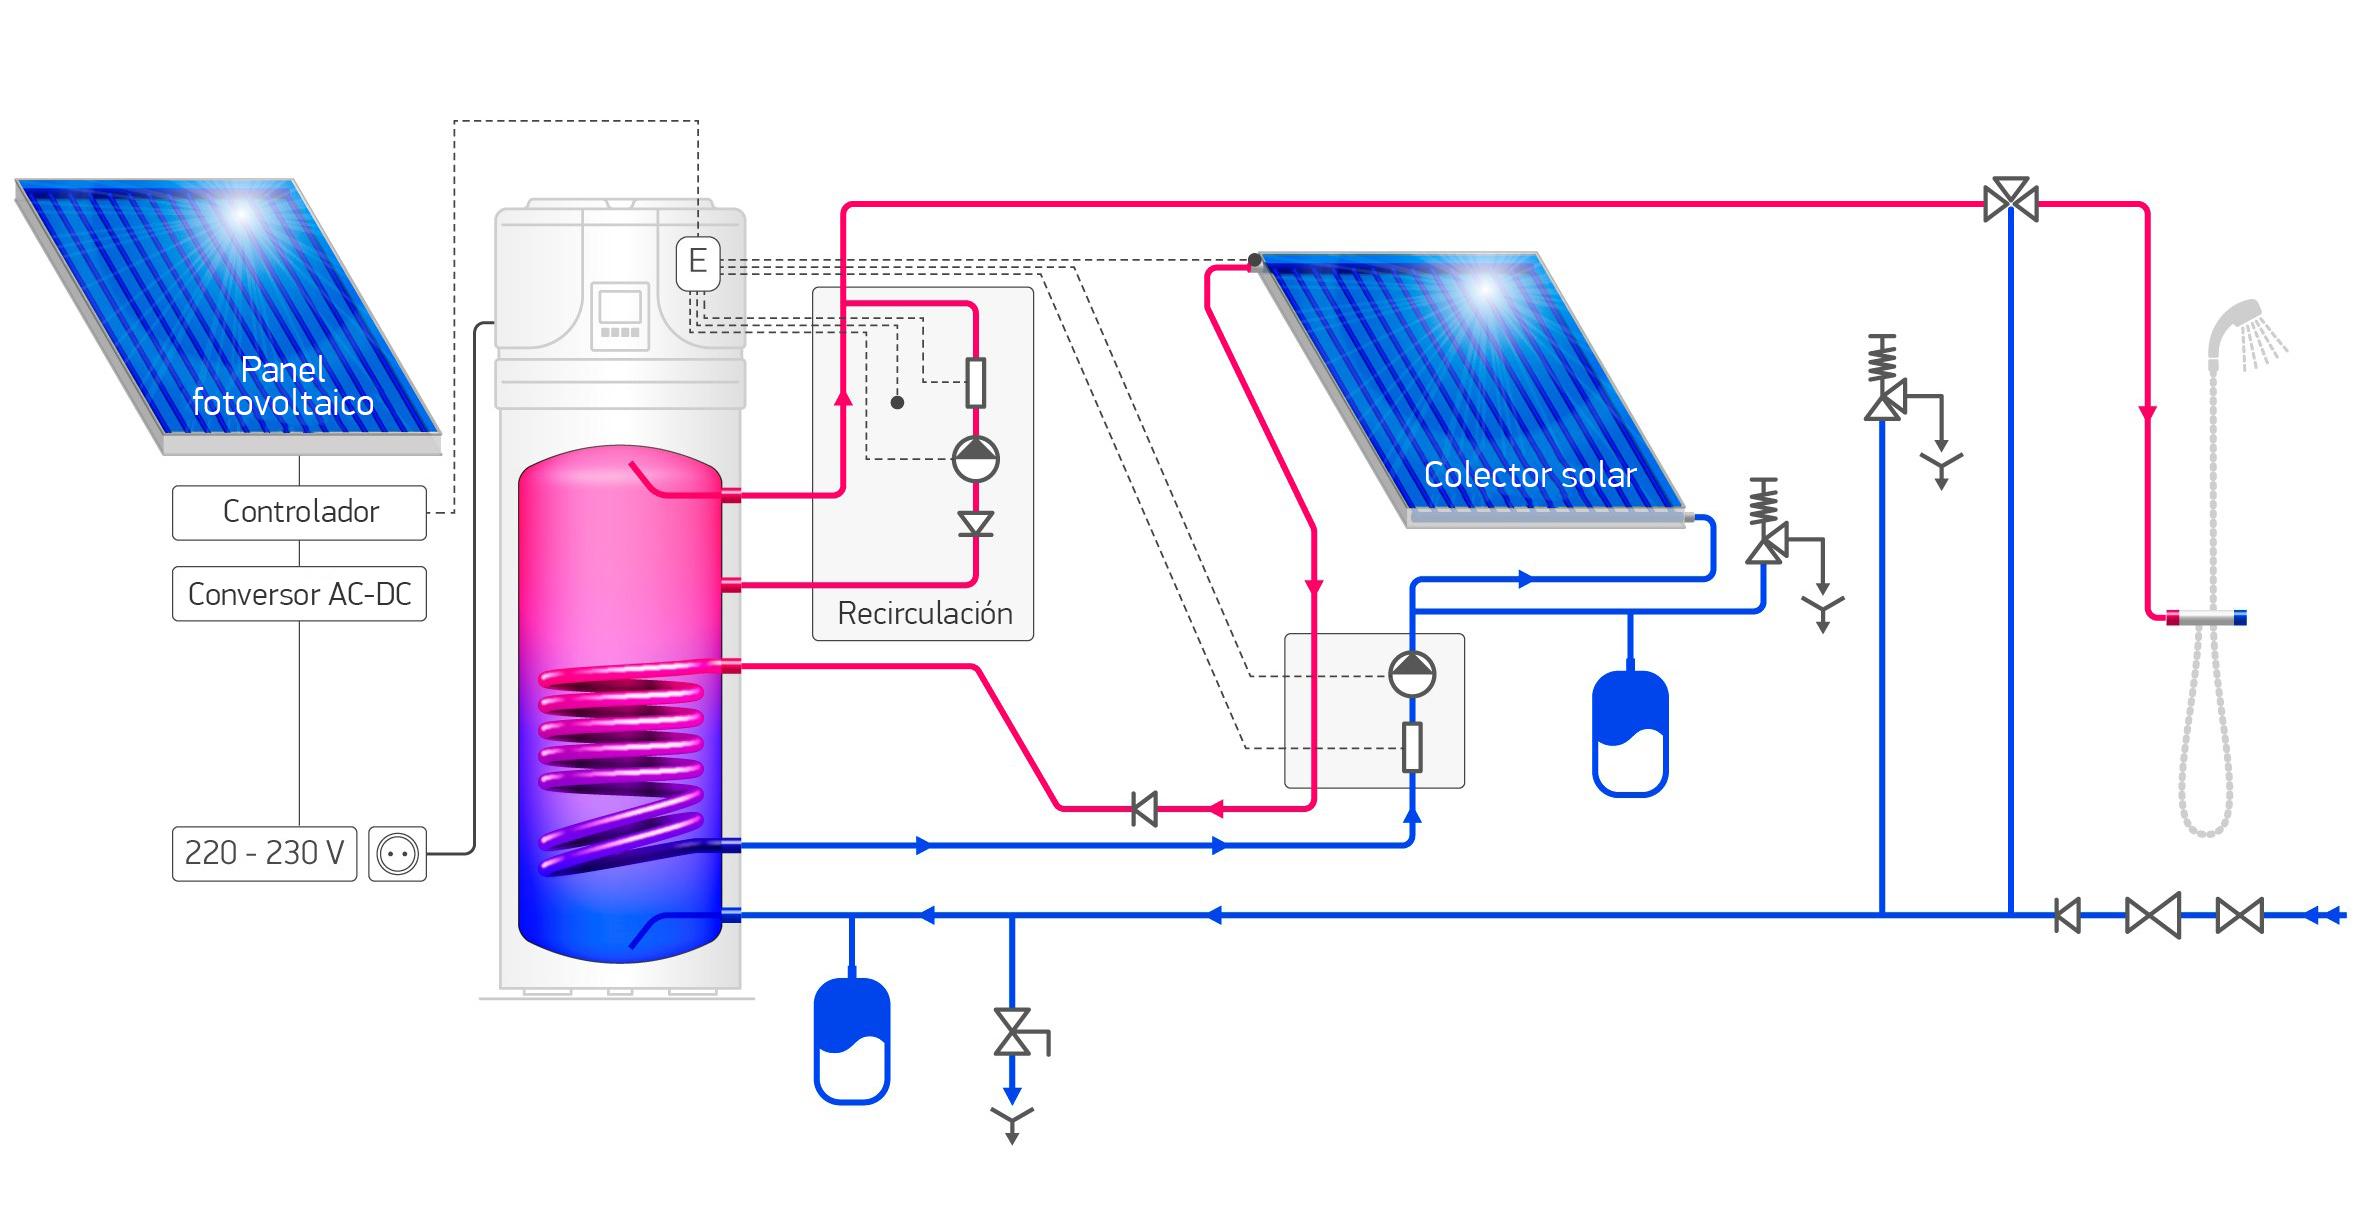 Conexión a panel fotovoltaico y sistema solar térmico